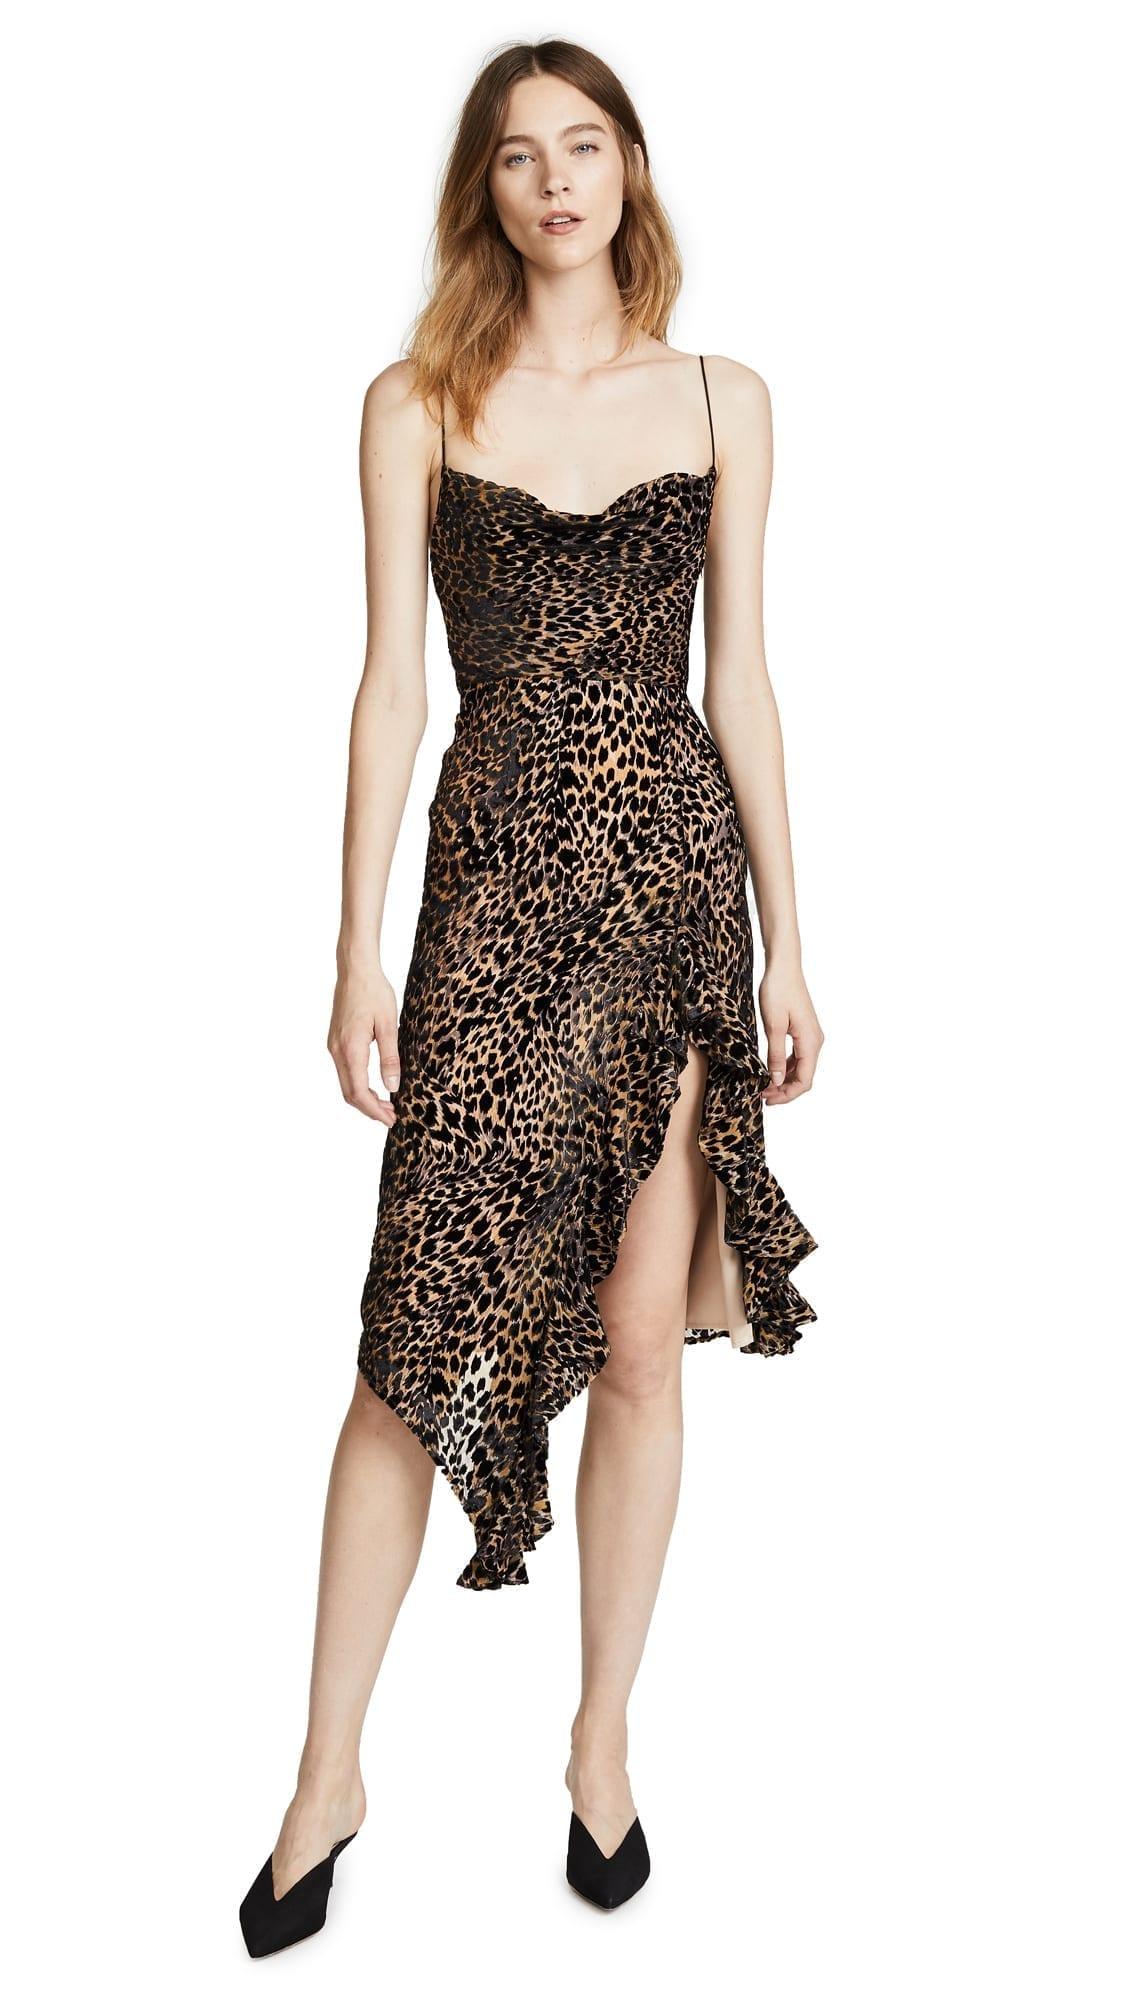 57a6b053ec30 MISHA COLLECTION Emilia Leopard Dress - We Select Dresses